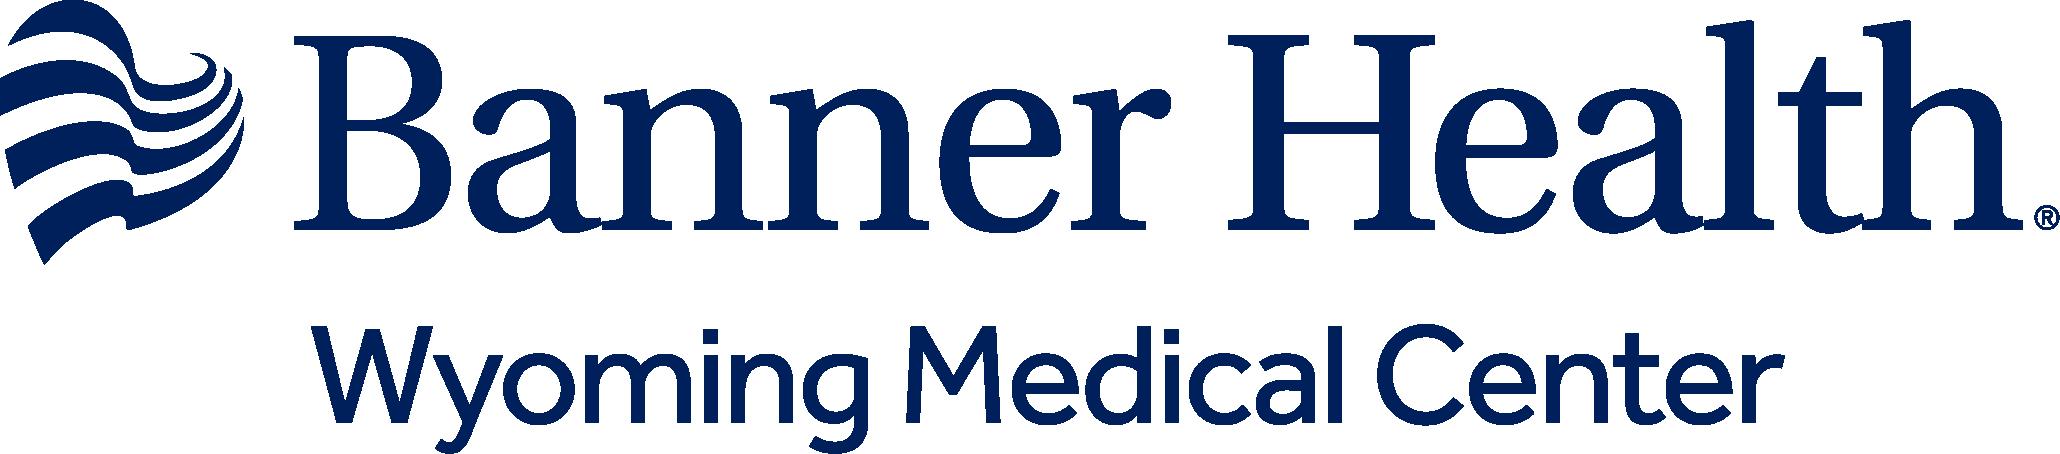 Banner Health Wyoming Medical Center logo blue